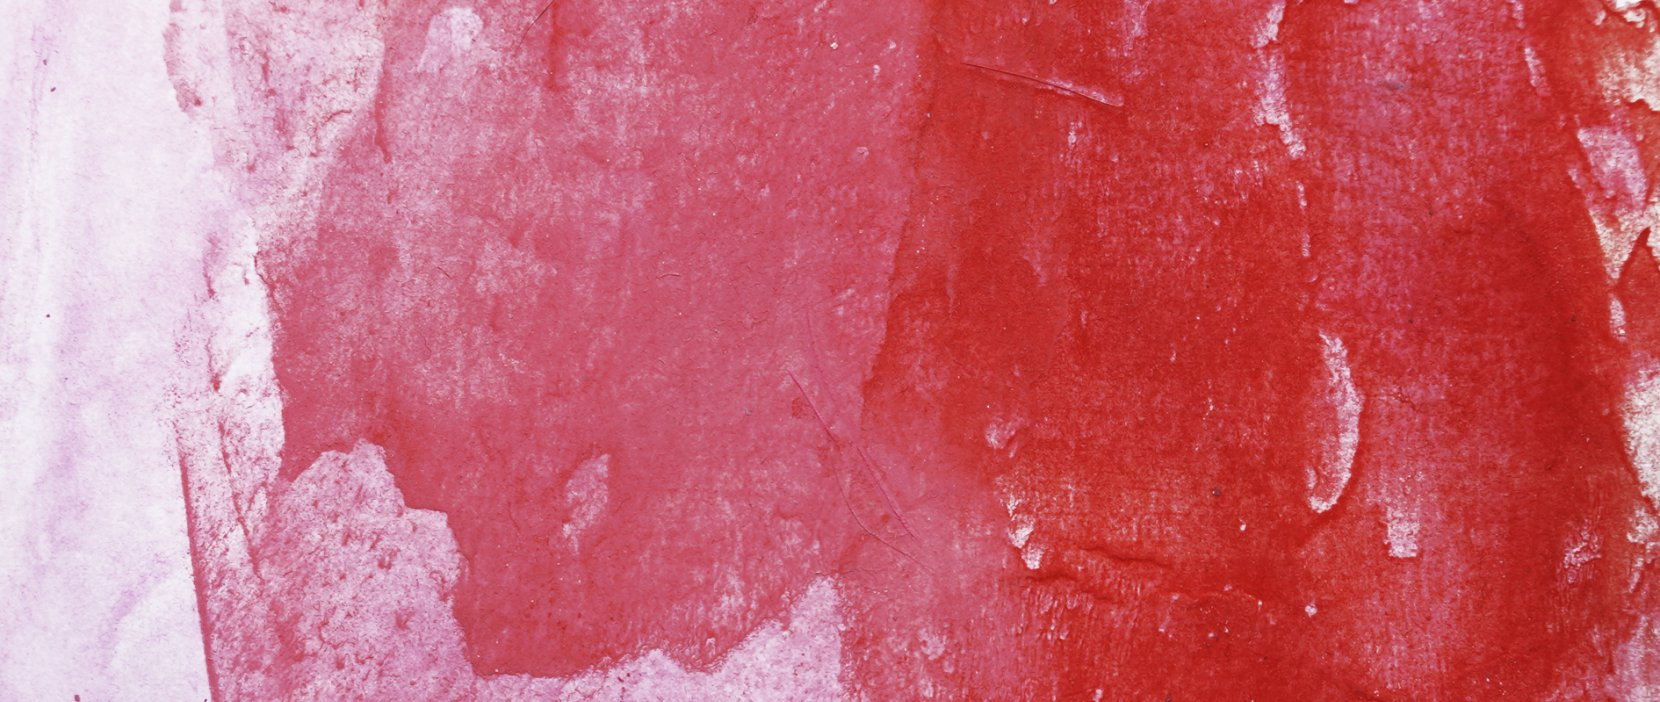 Start-up-forside rød